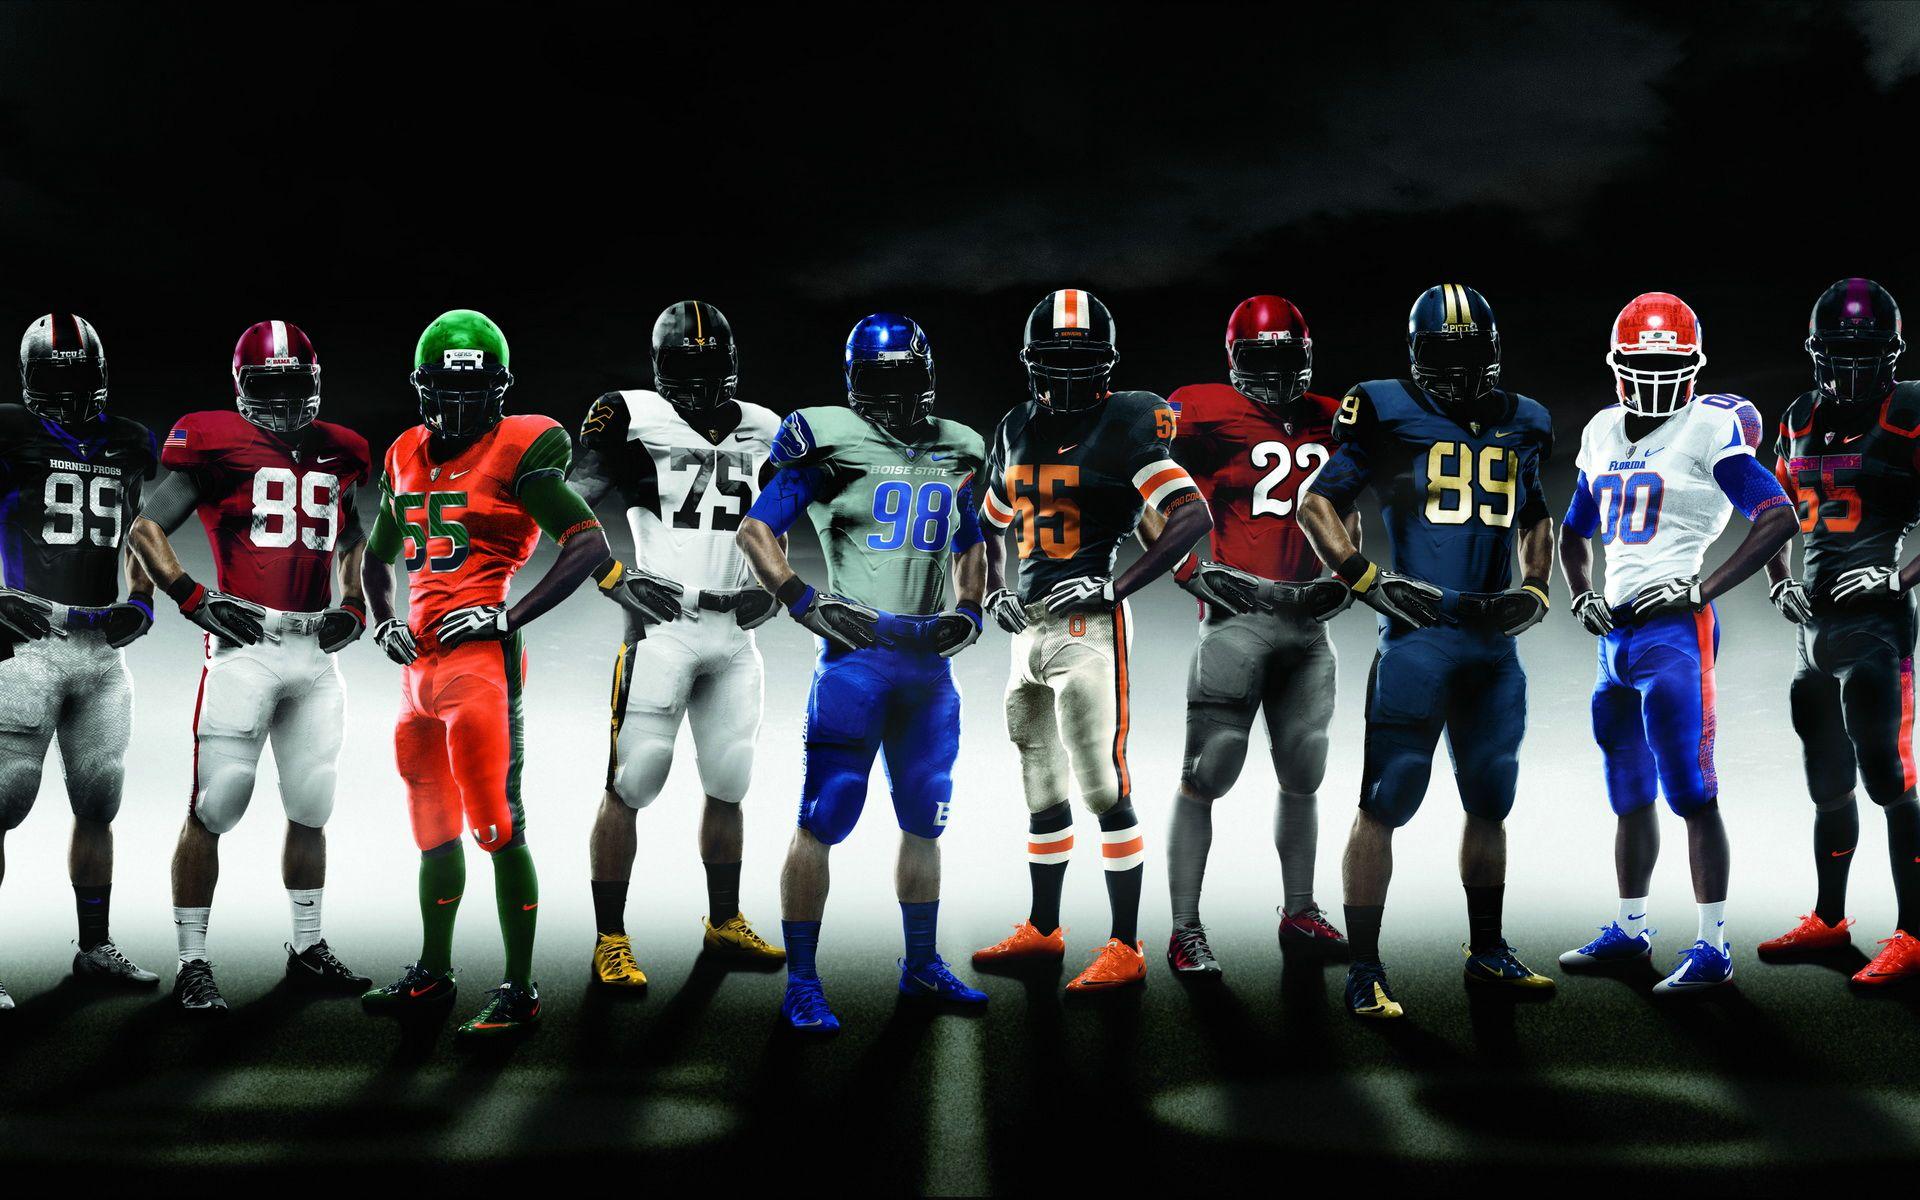 Ставки на sports ufc online play